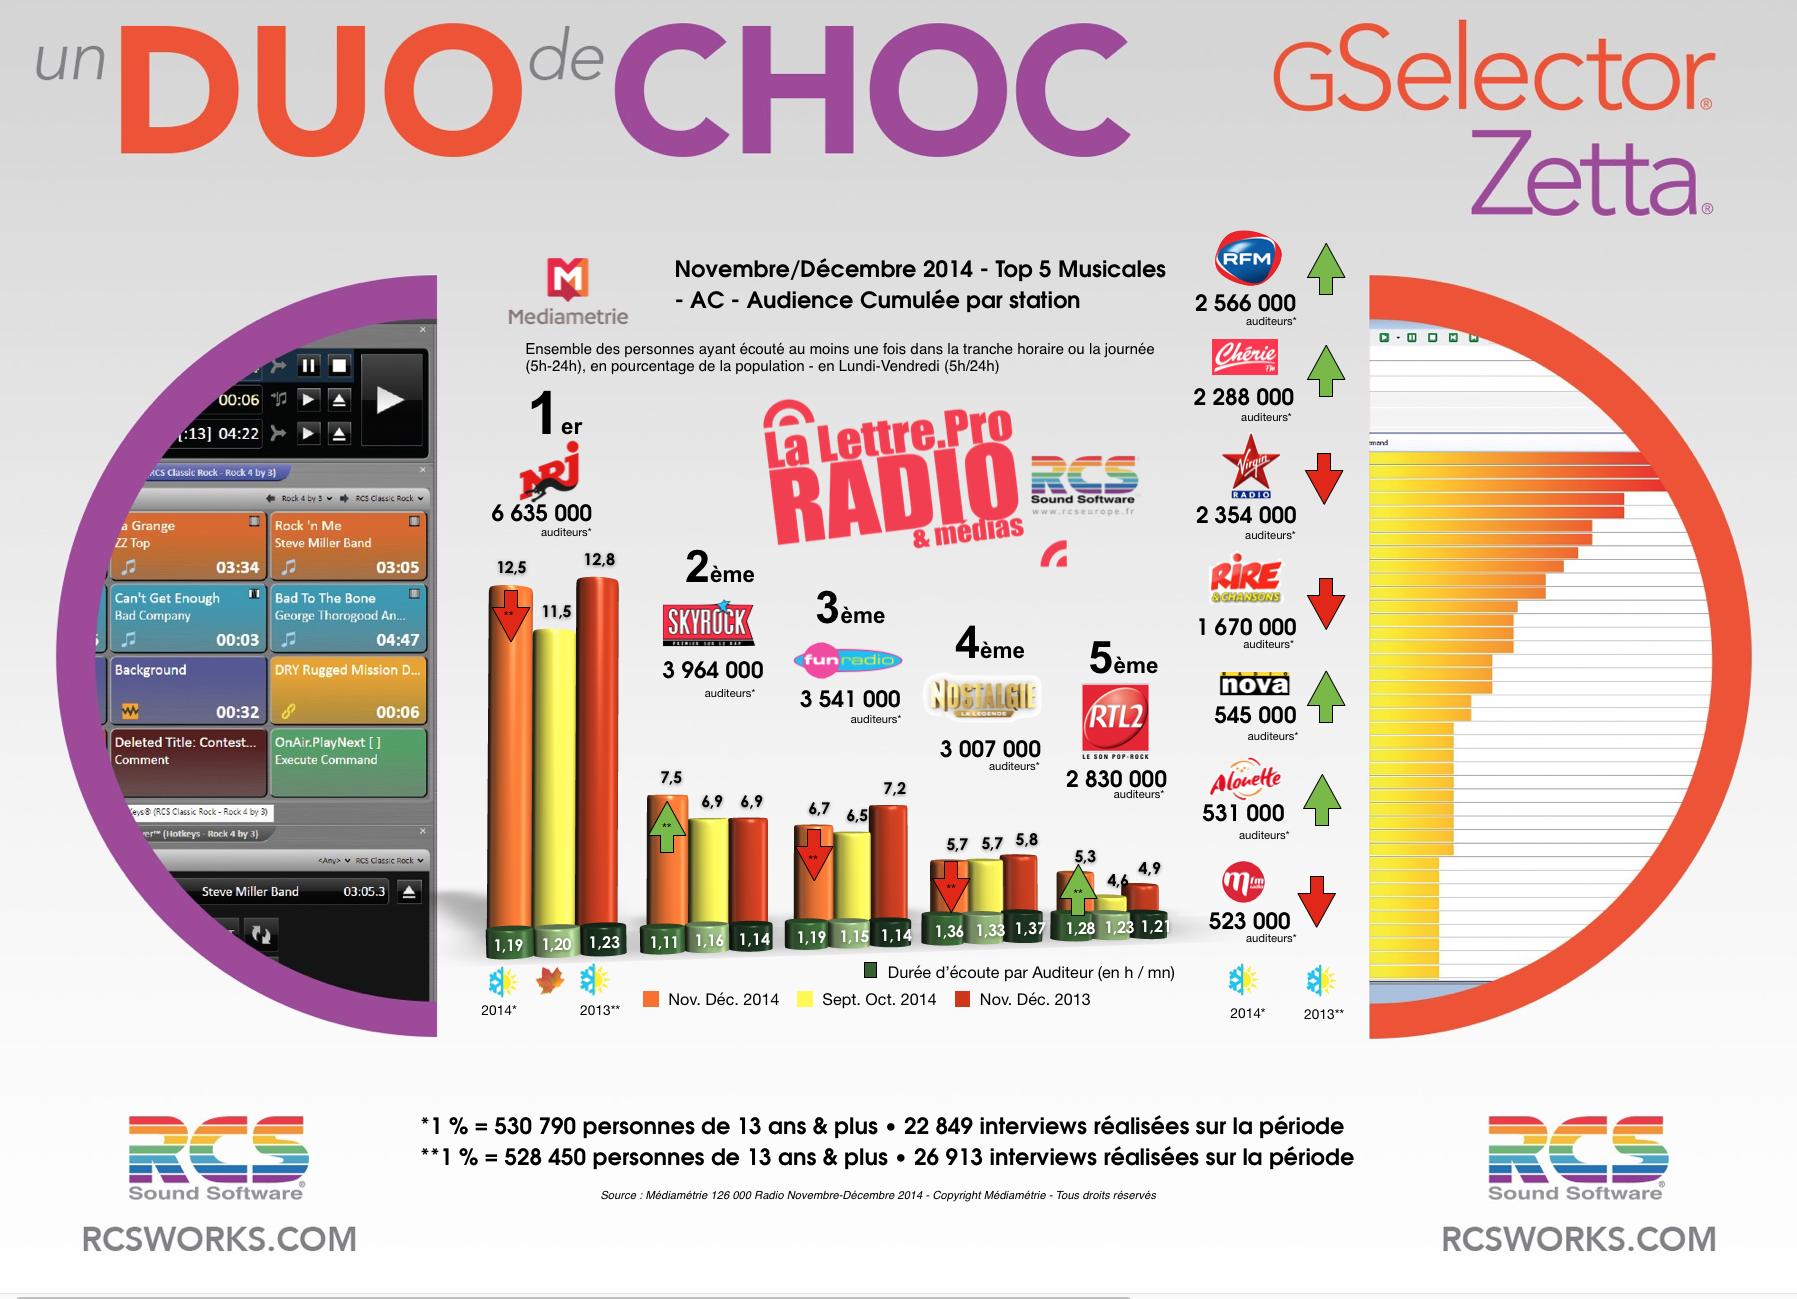 TOP 5 Musicales - Diagramme exclusif LLP/RCS GSelector-Zetta - Novembre/Décembre 2014